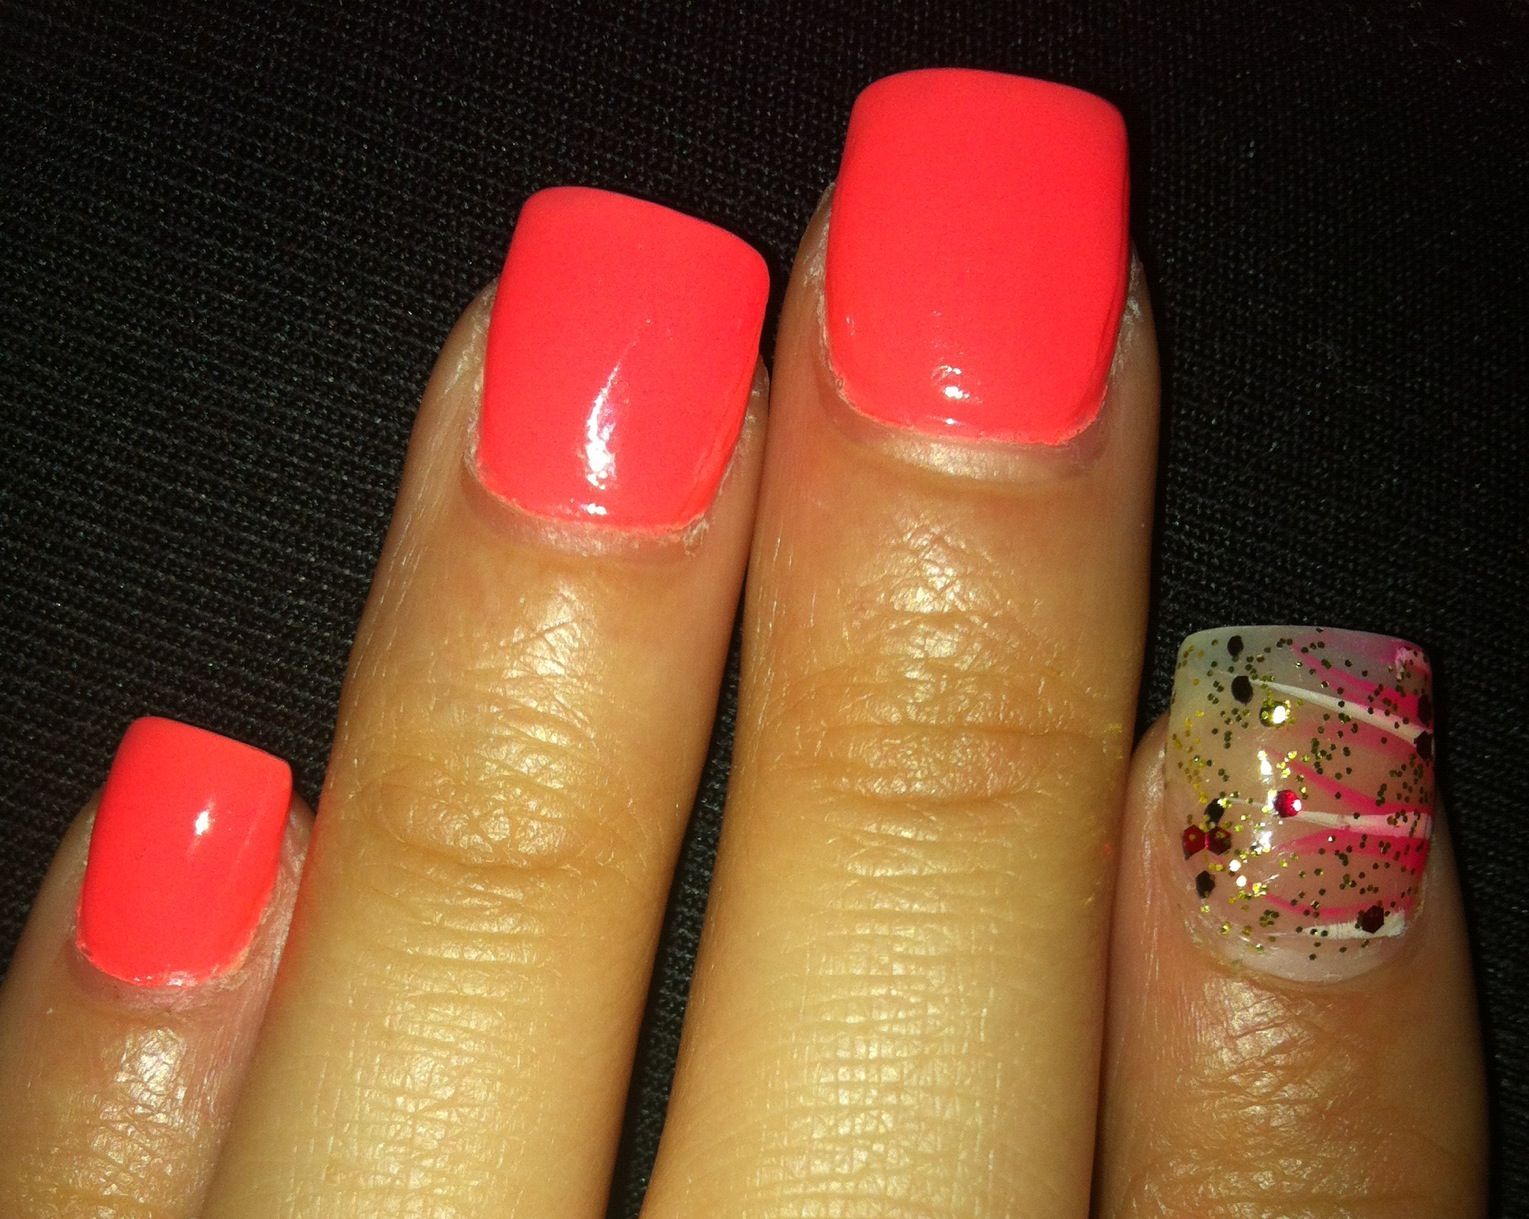 Full color nail art - I Like My Full Color Acrylic Nail